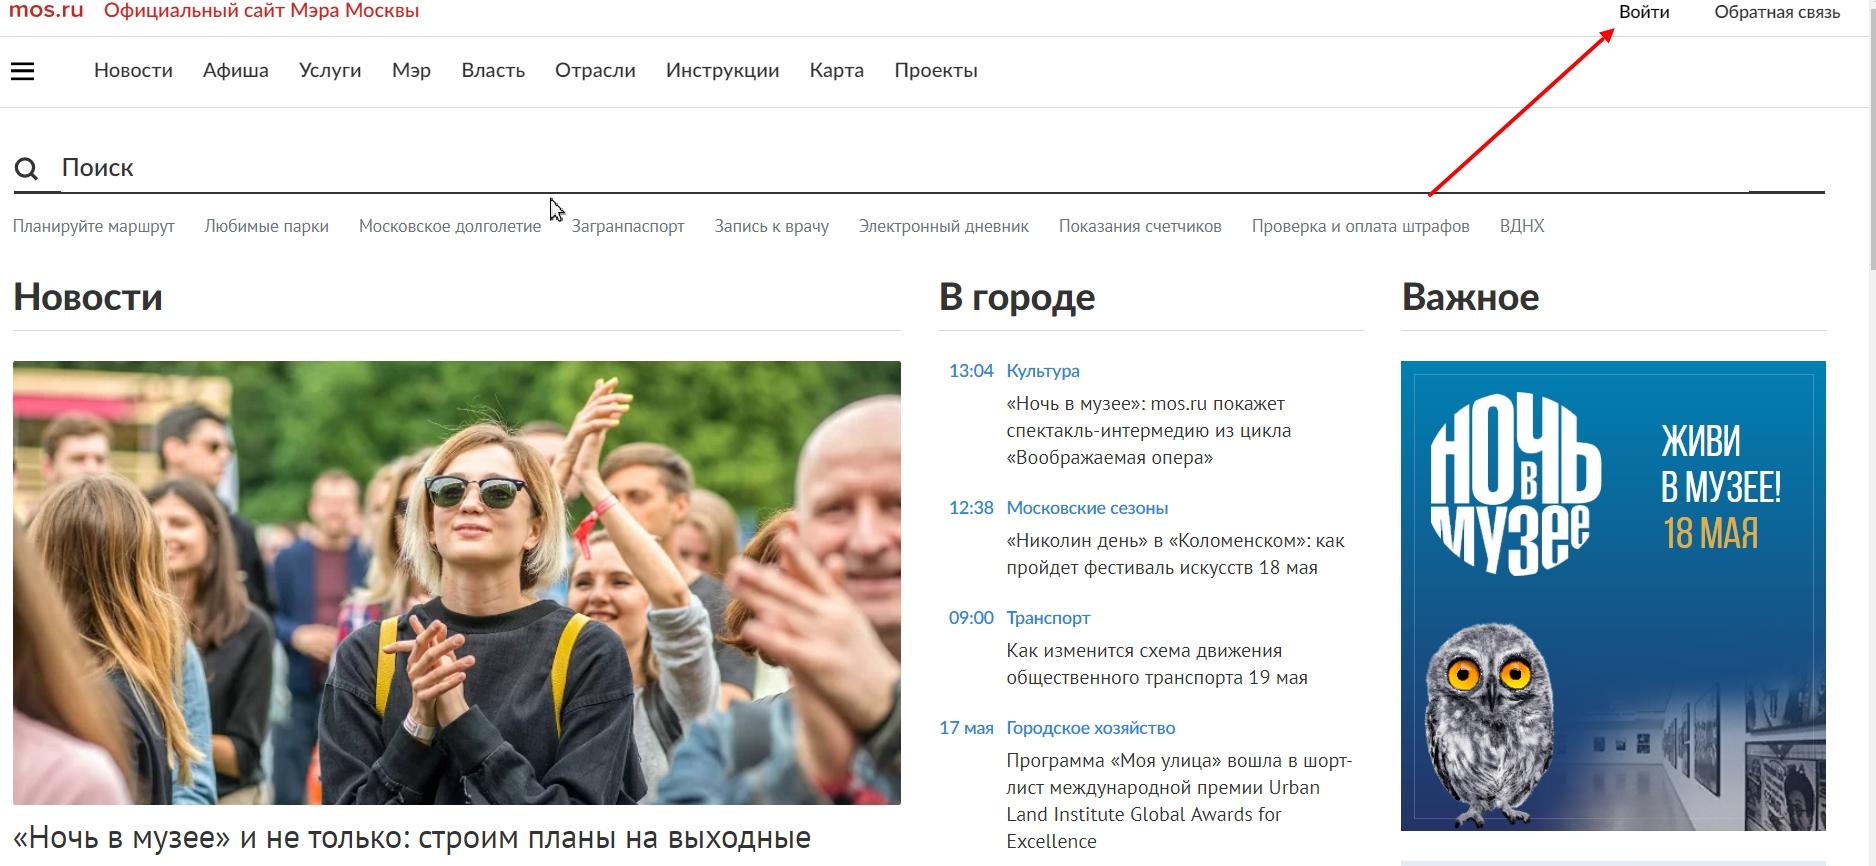 Авторизация на сайте мэра Москвы